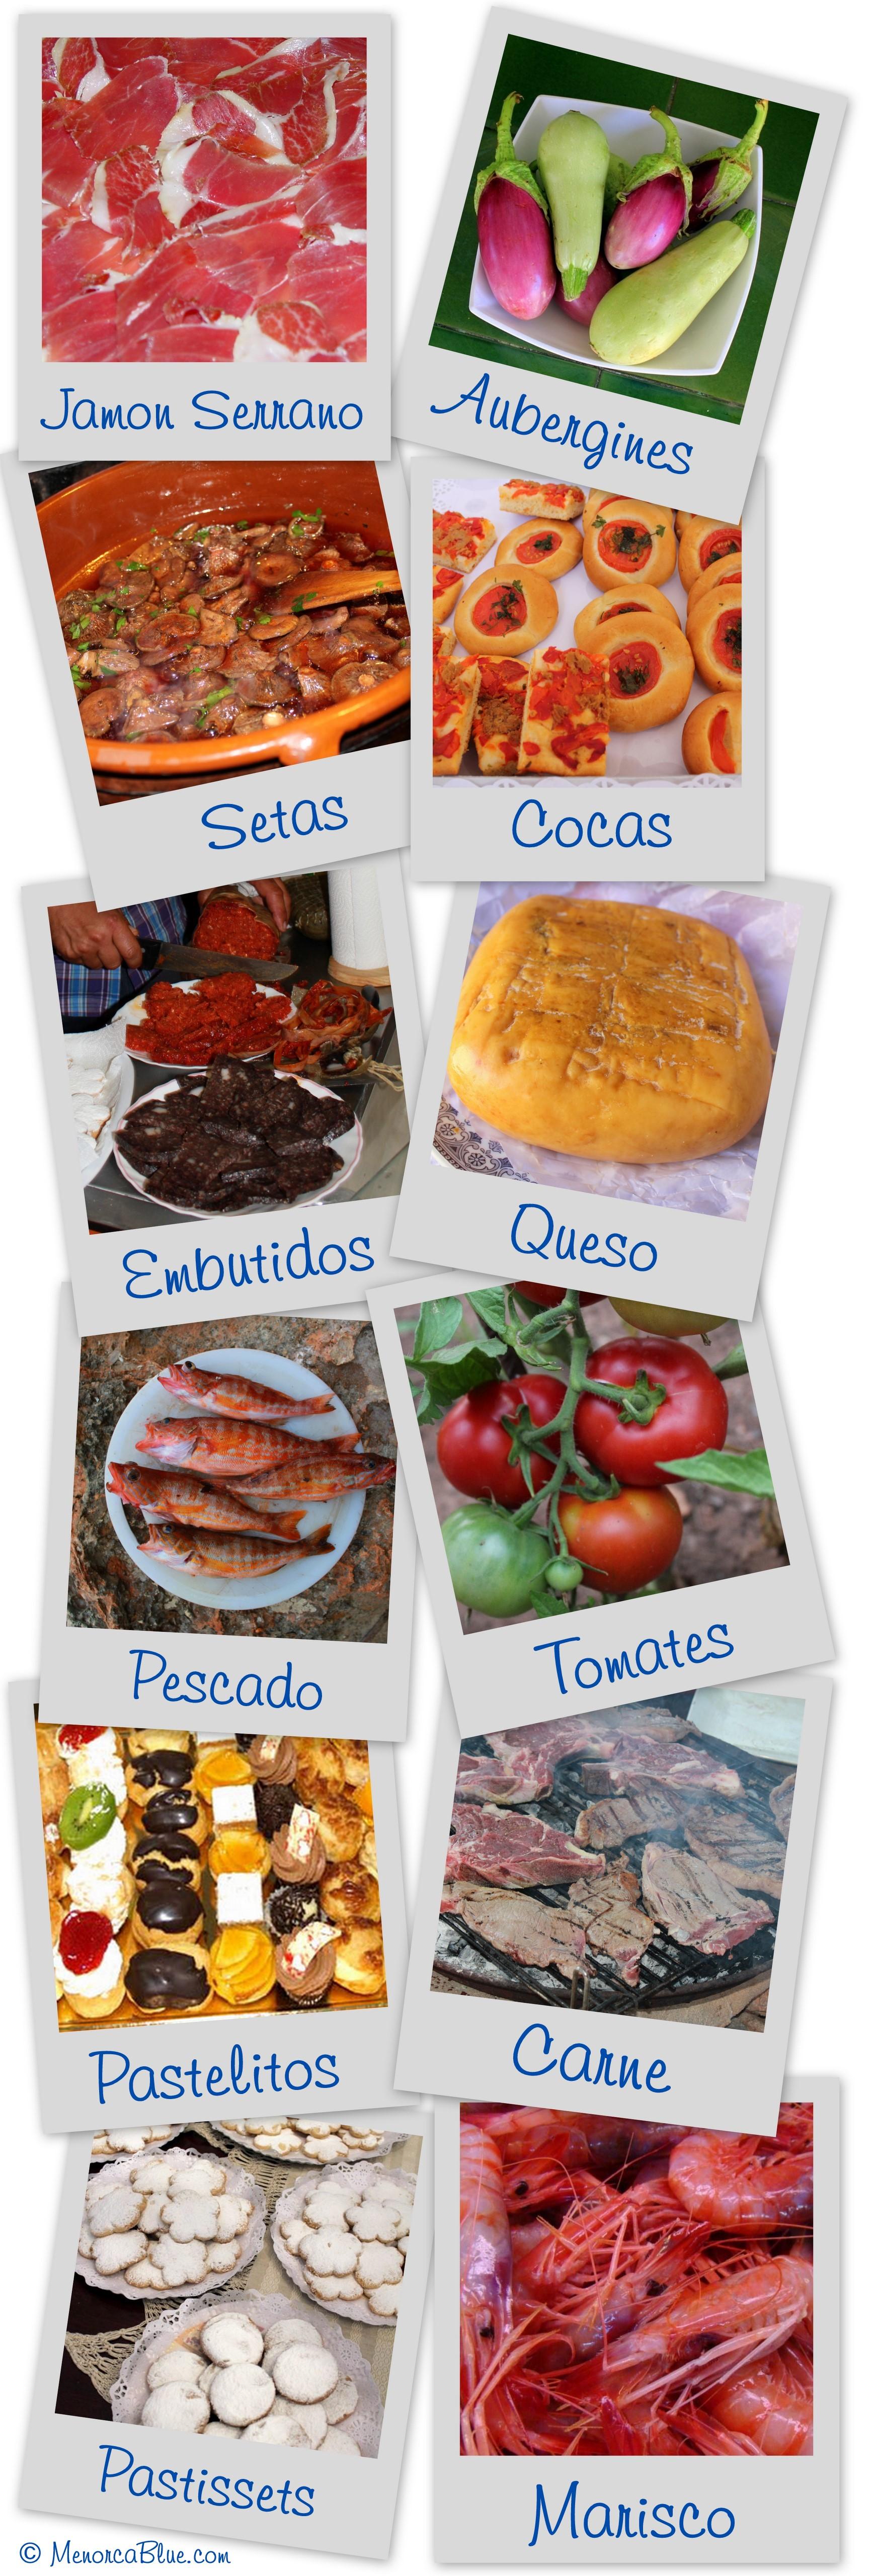 Typical Menorcan Food - Menorca Blue